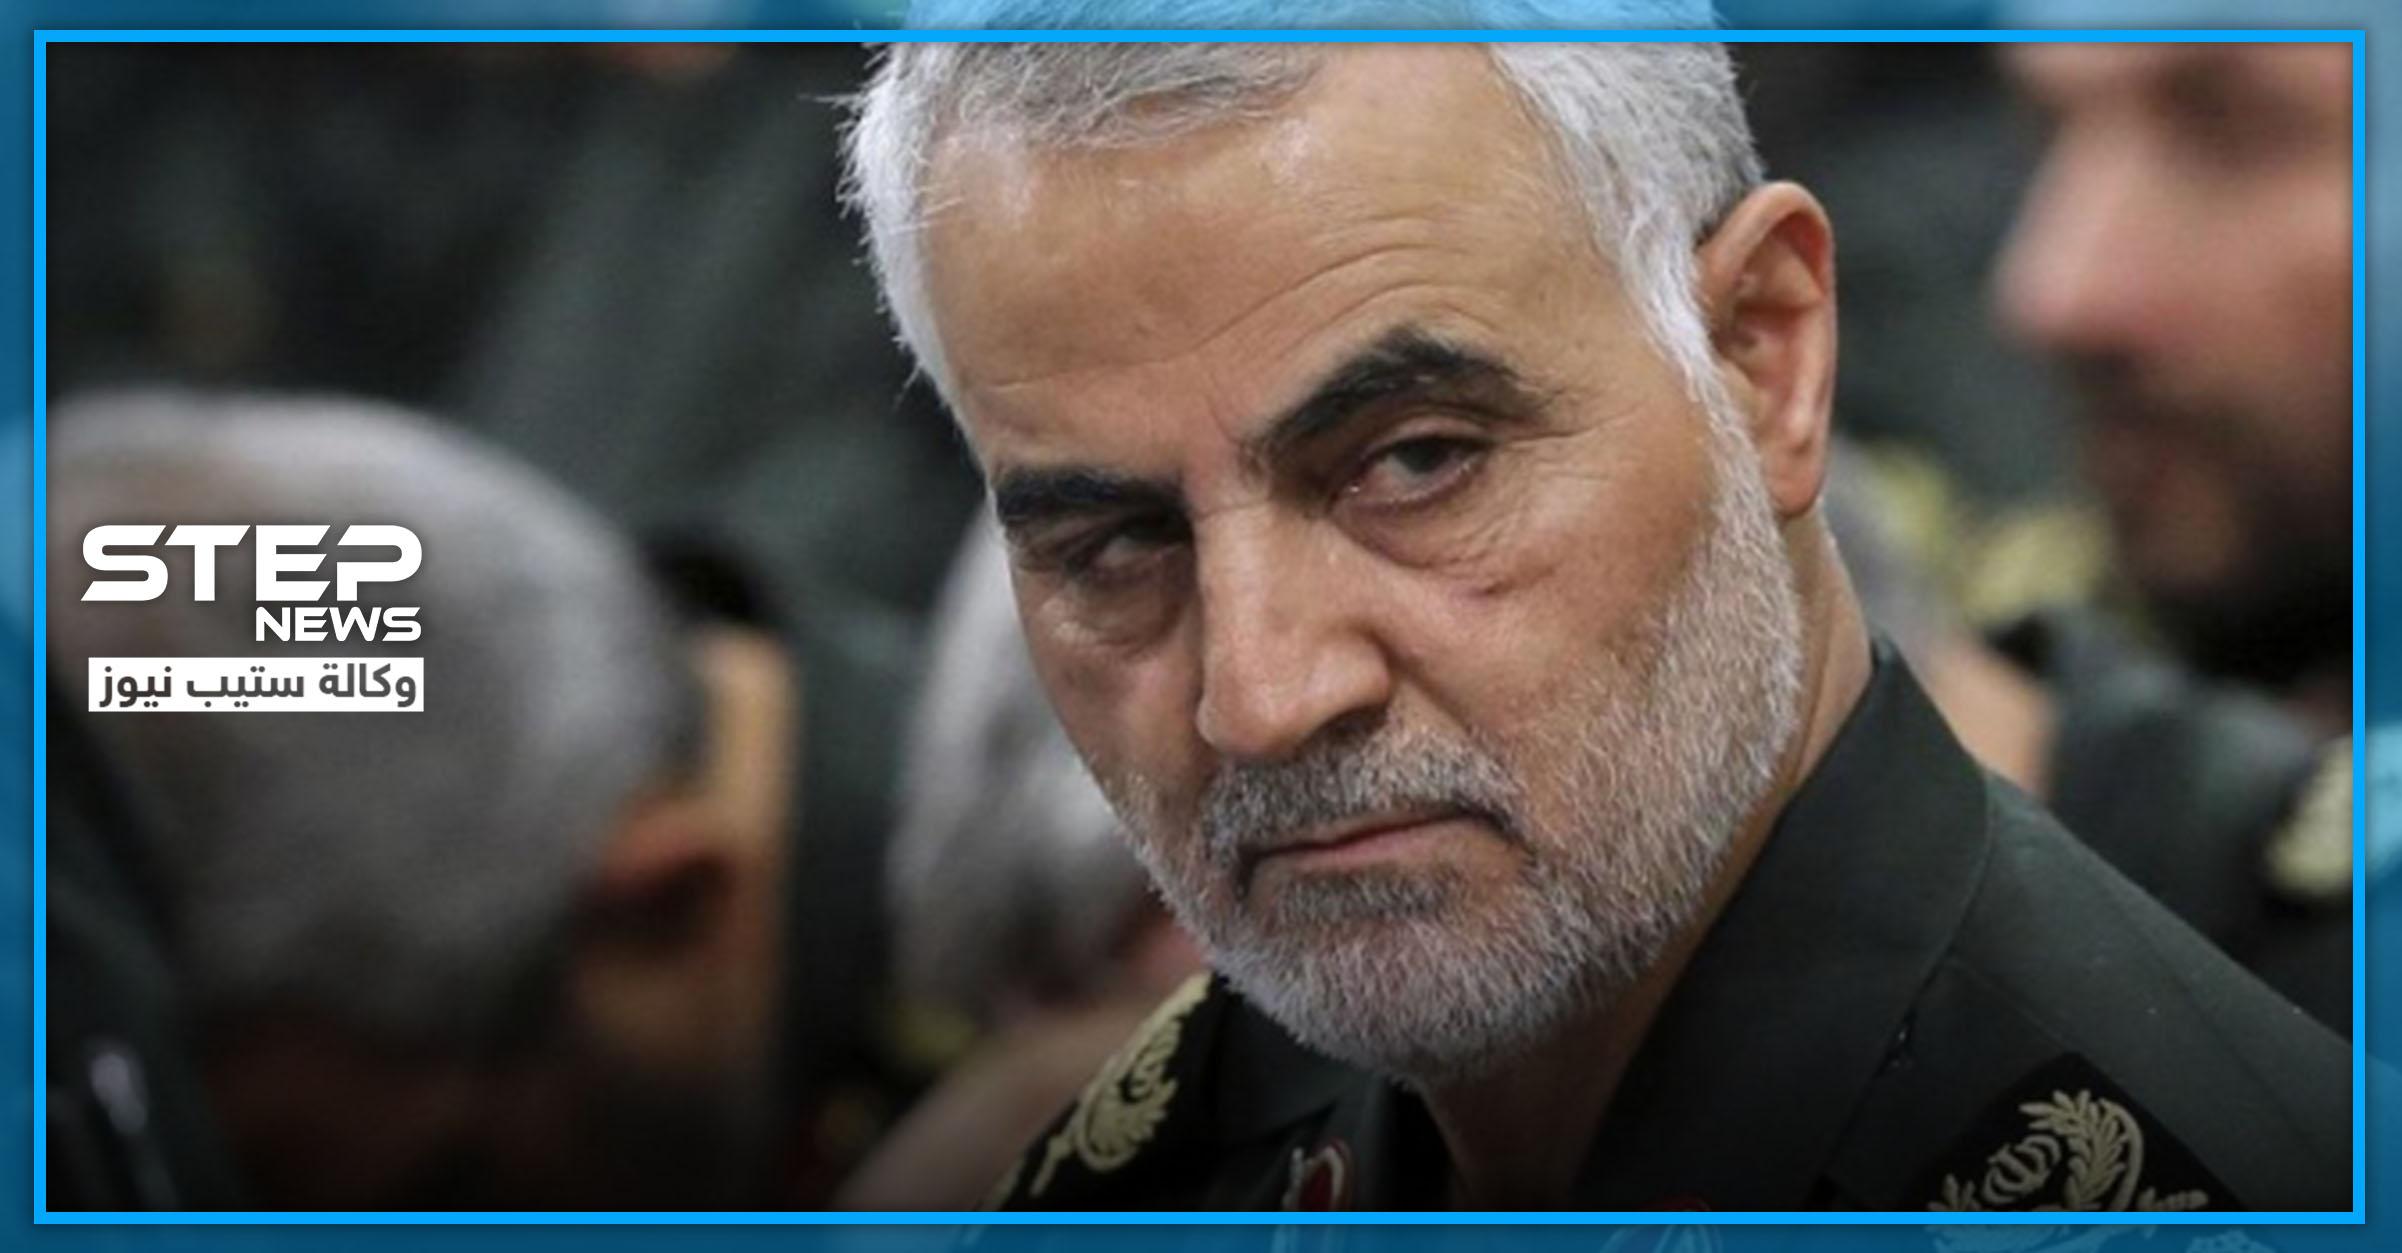 إيران تحكم بالإعدام لجاسوس أفشى مكان قاسم سليماني